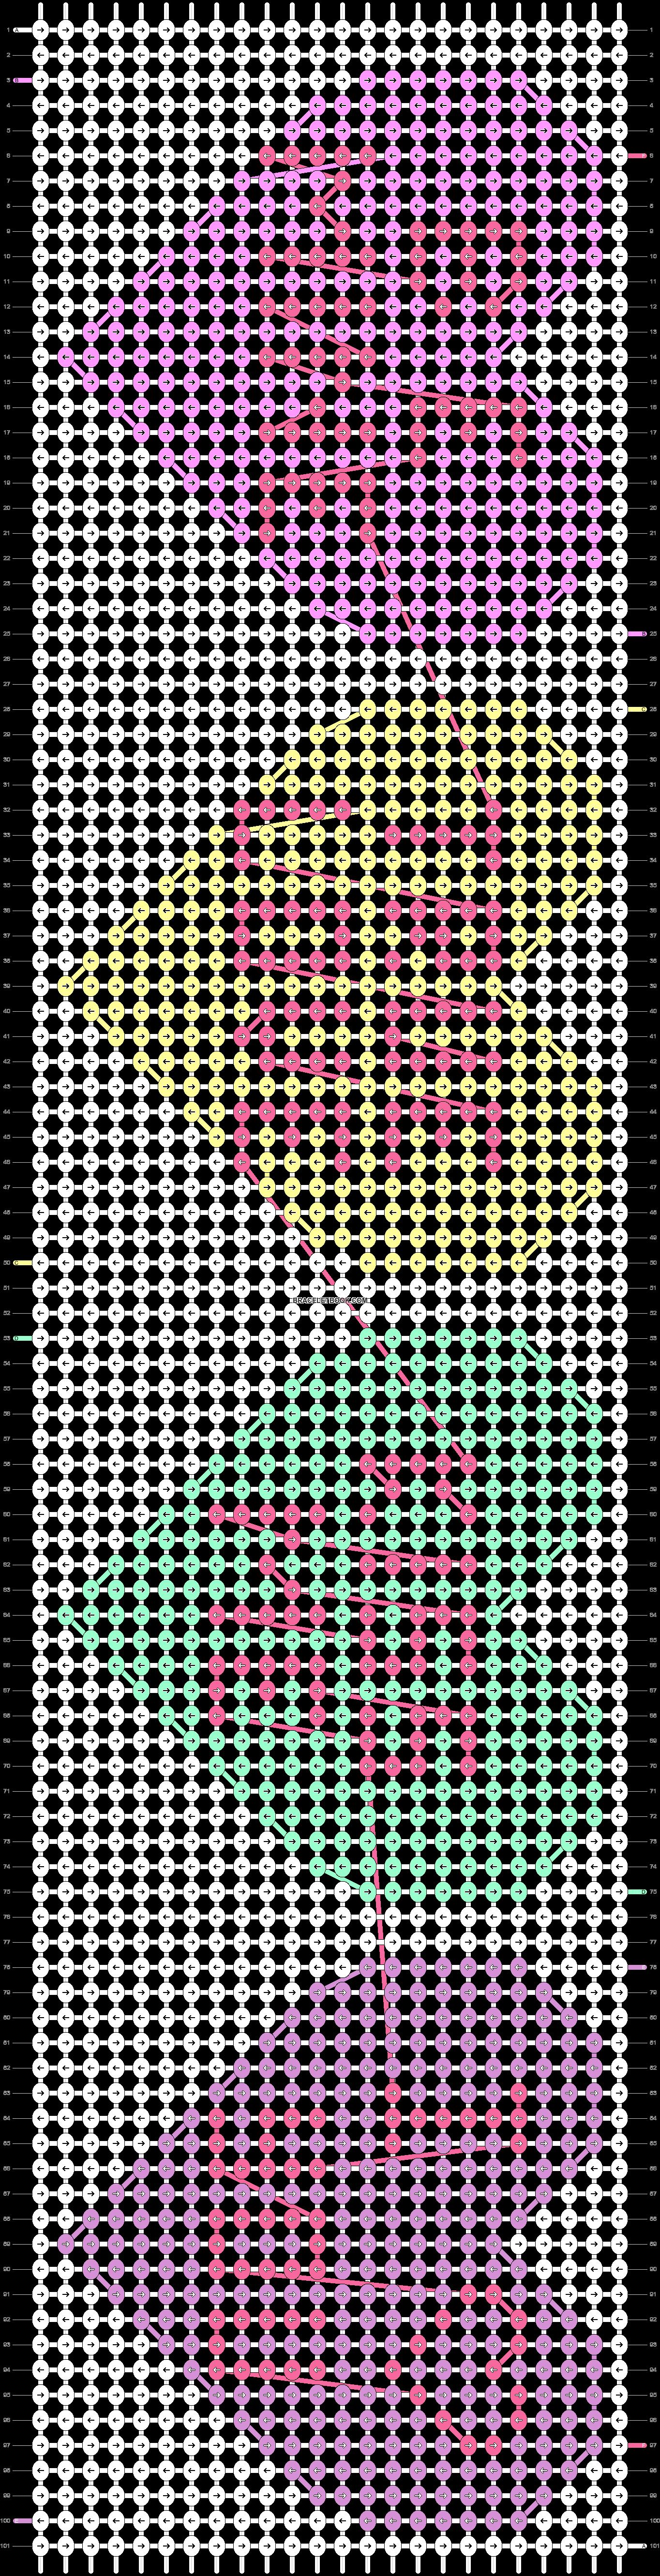 Alpha Pattern #12789 added by blueisbest